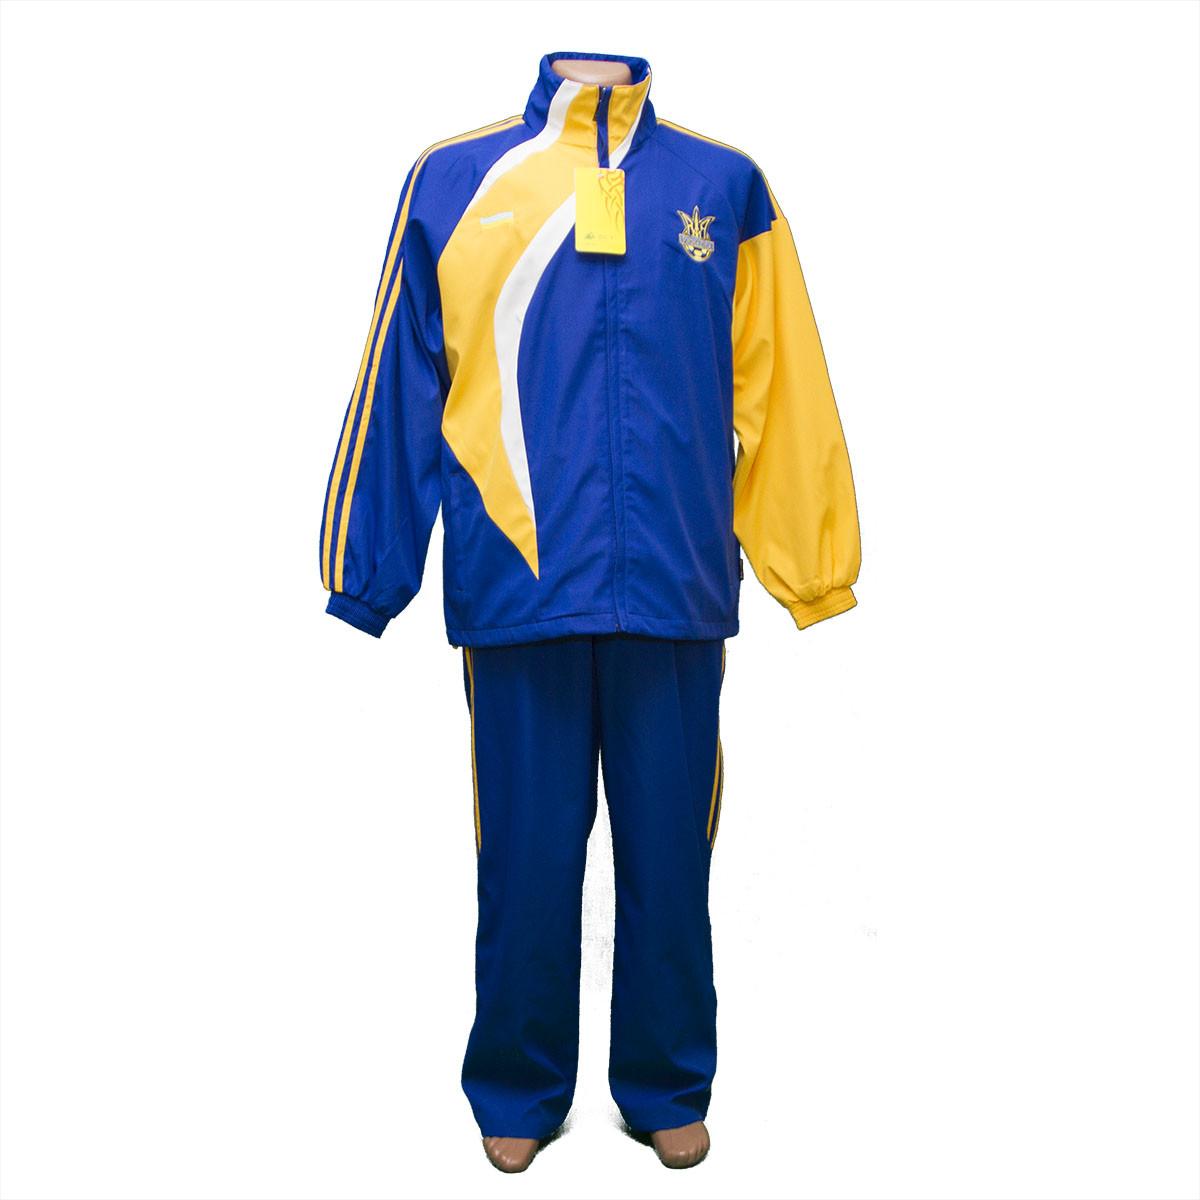 0e07da9c Мужской спортивный костюм